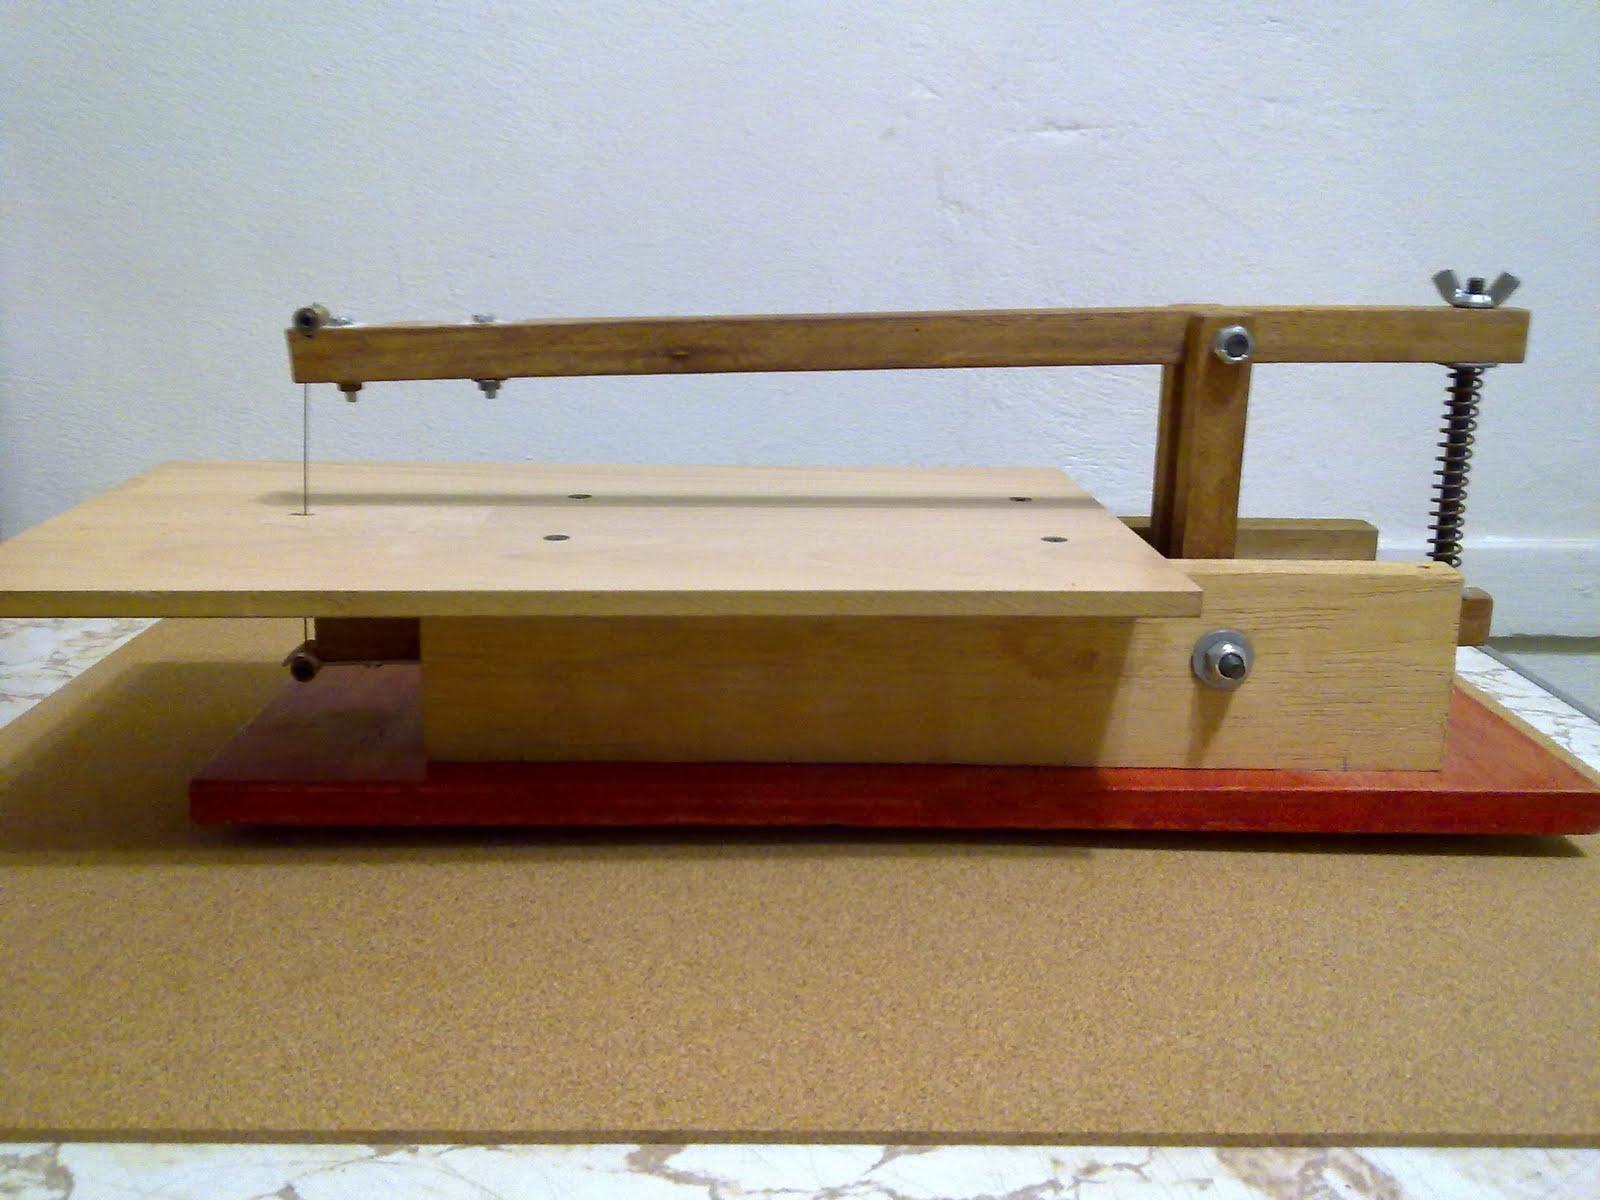 Creando con madera sierra para marqueter a - Sierras electricas para madera ...